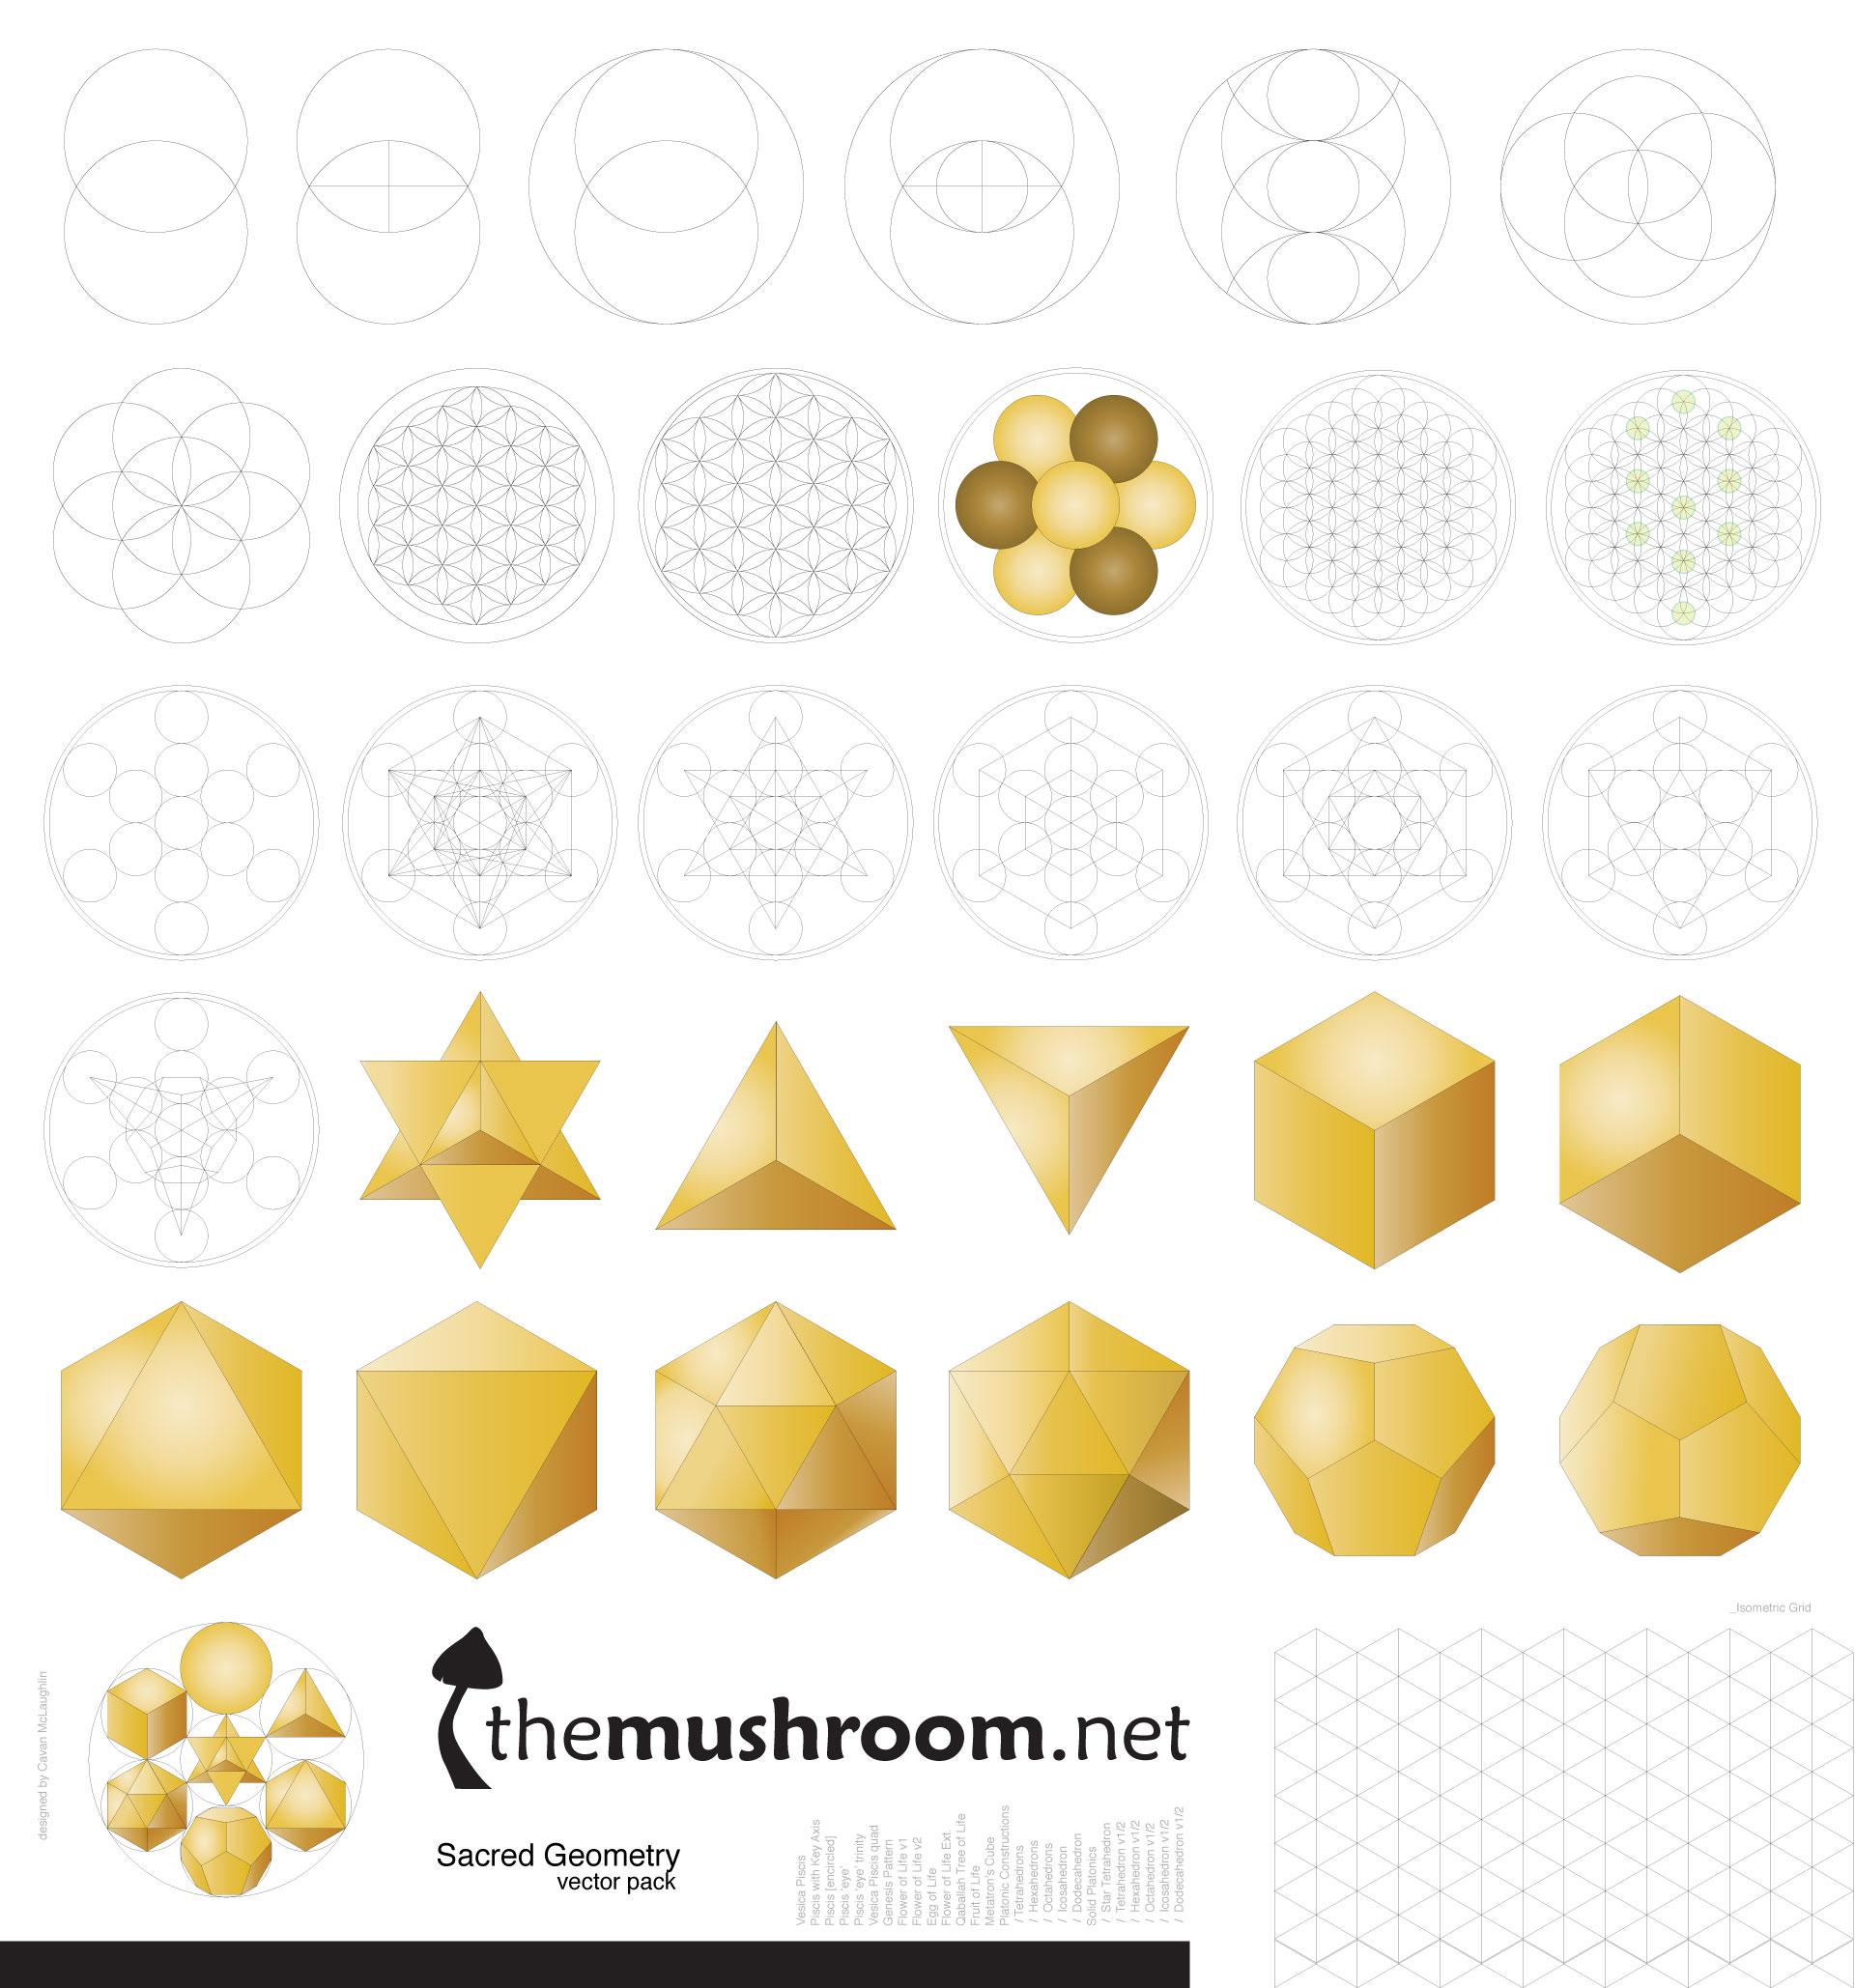 Free Sacred Geometry Vector Pack | The Mushroom [ themushroom net ]